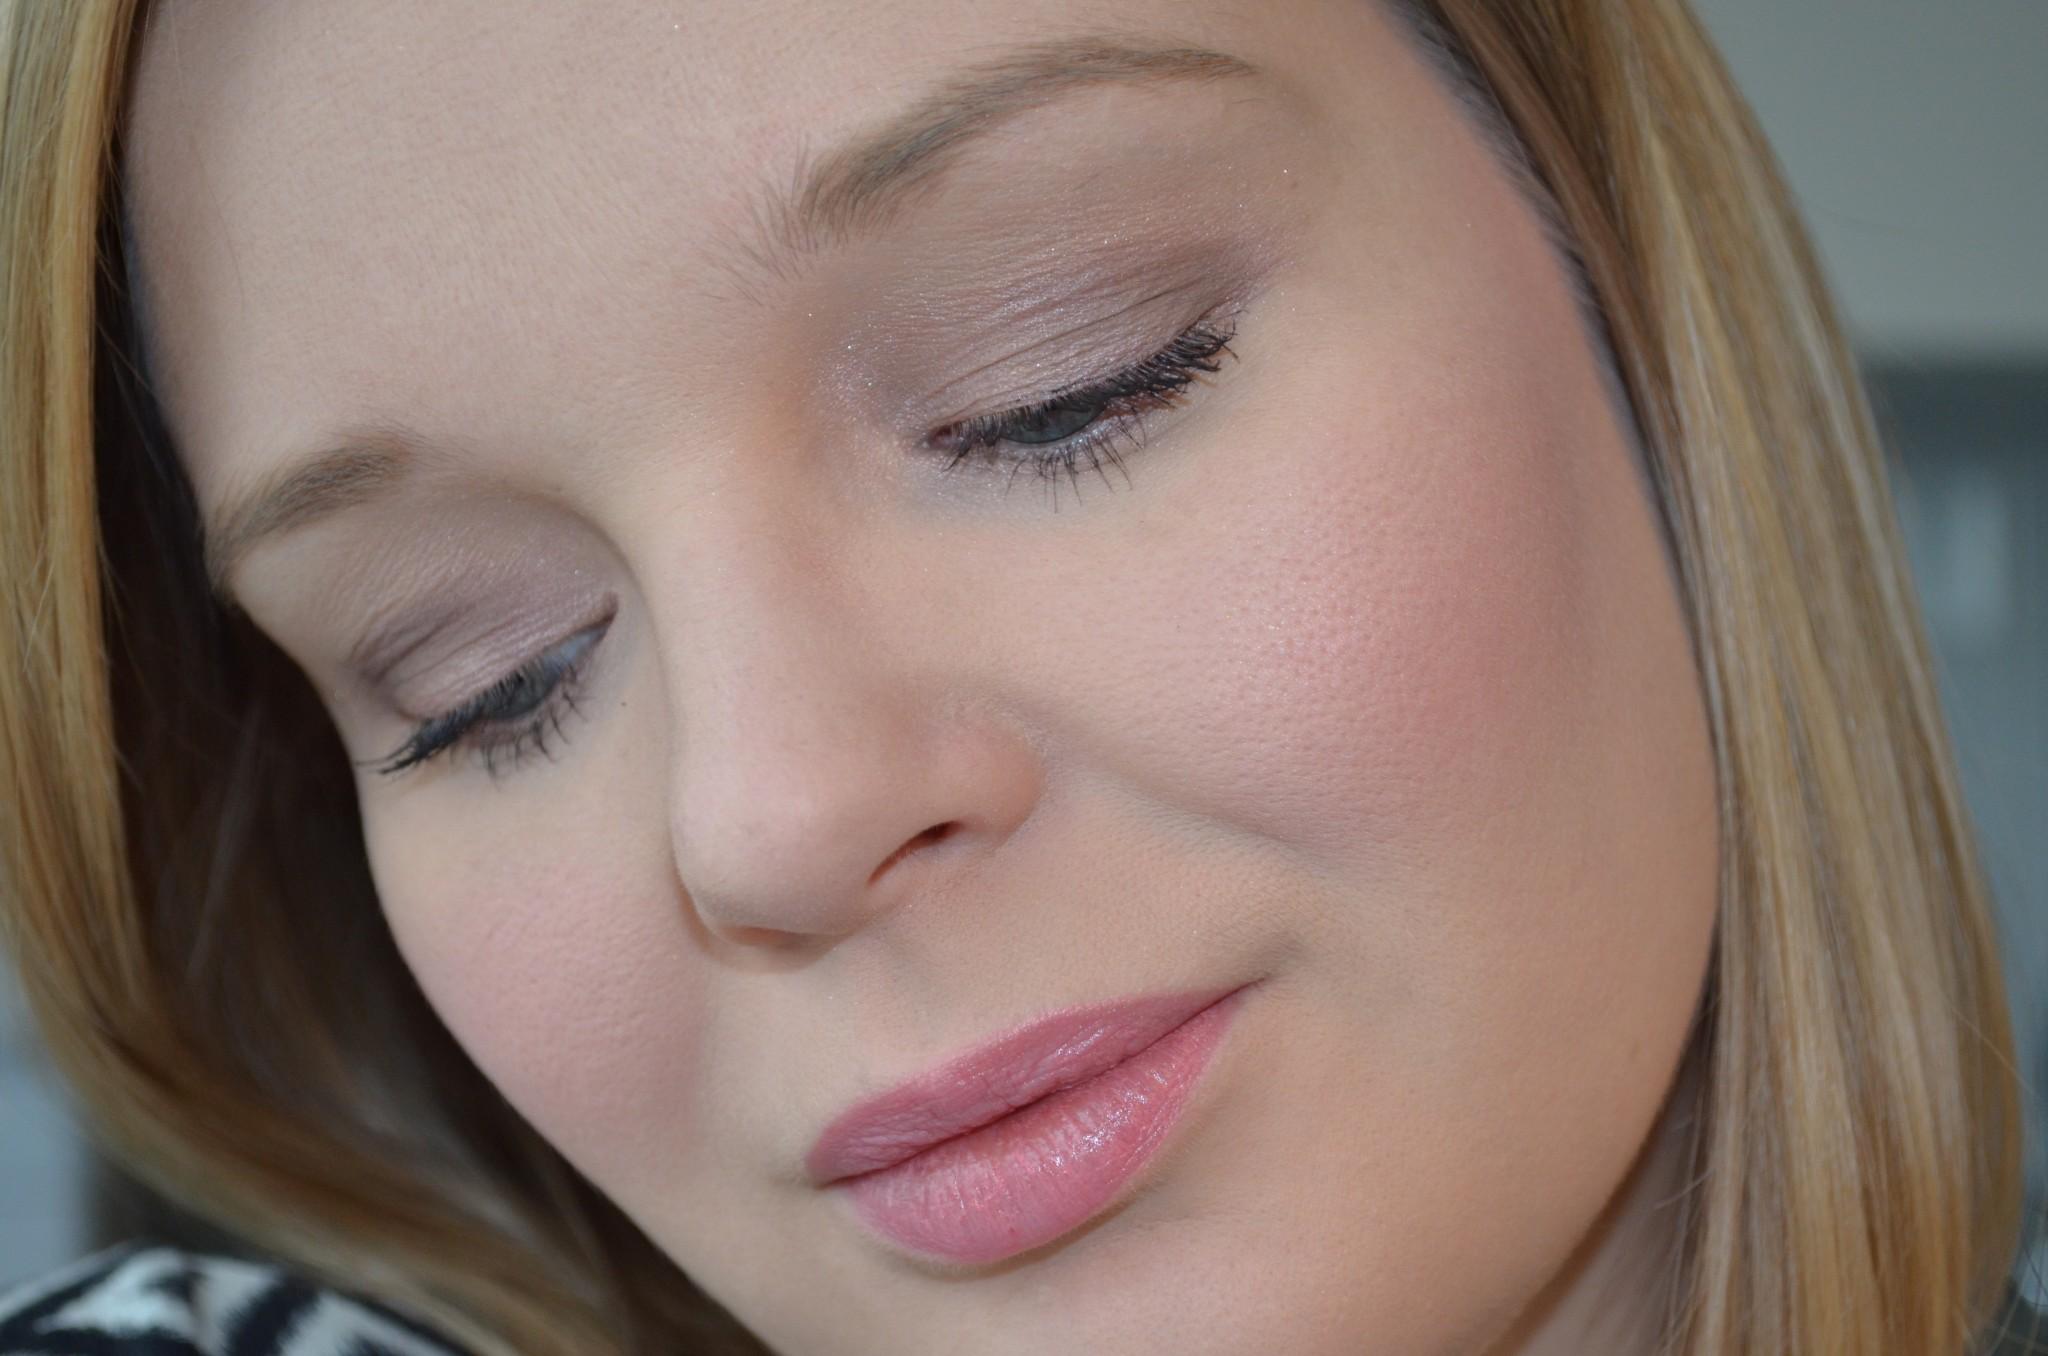 DSC 7023 1 - Nieuwe Inglot Freedom System Eyeshadow + Blush